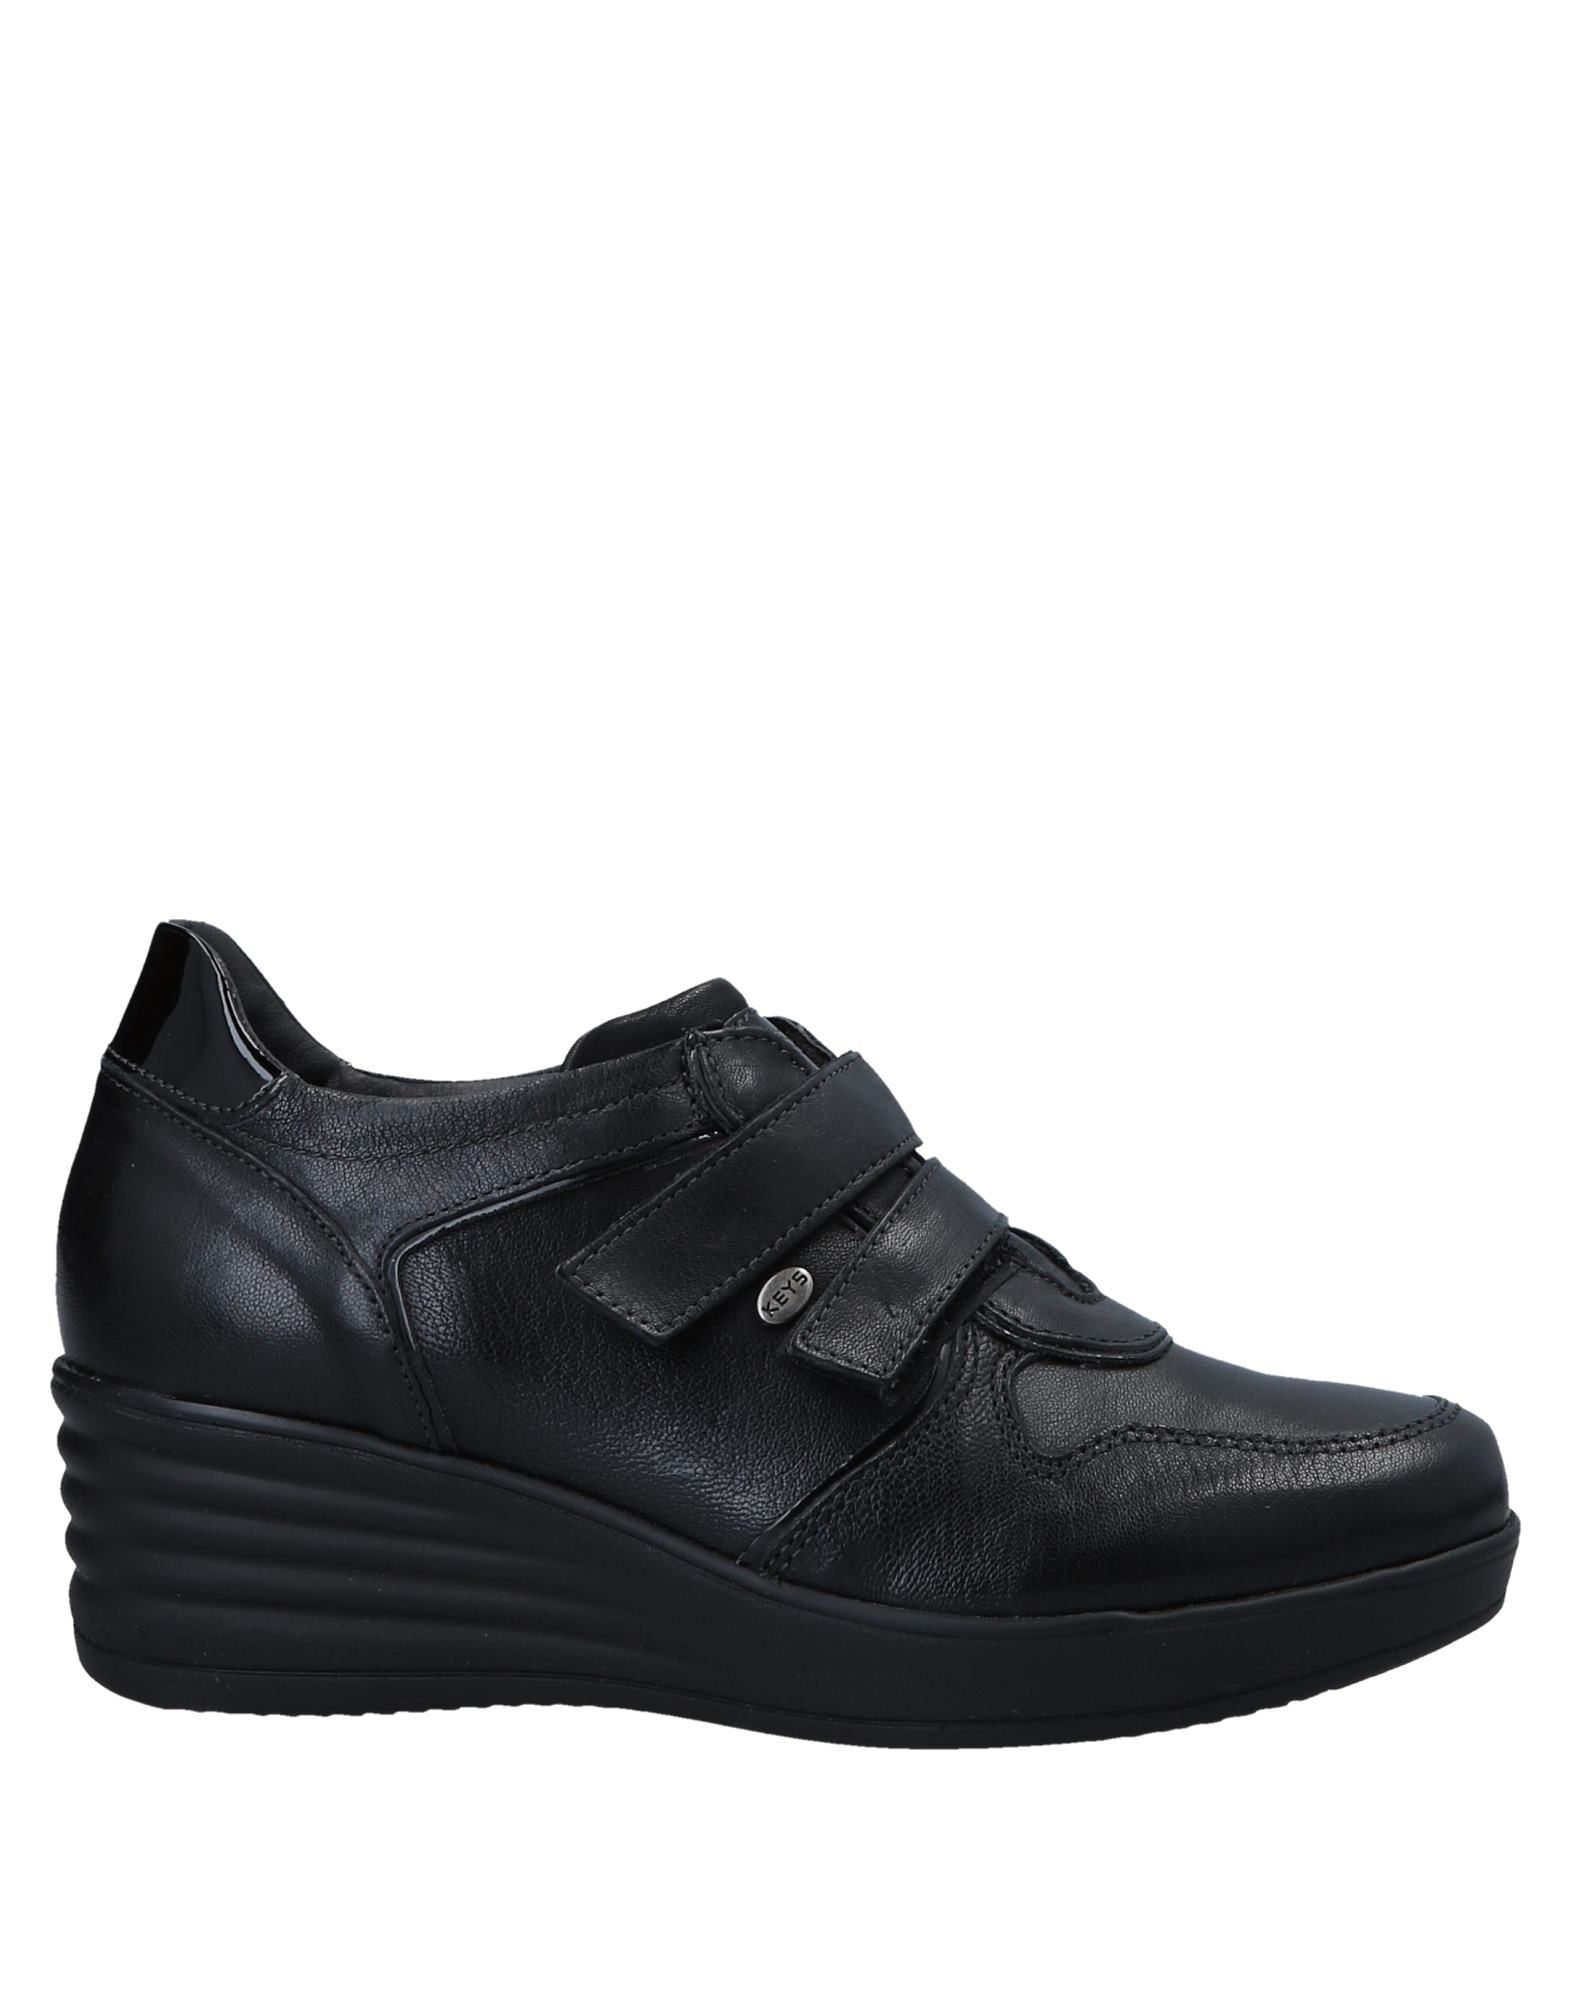 Keys Sneakers Gute Damen  11552495II Gute Sneakers Qualität beliebte Schuhe d713d6